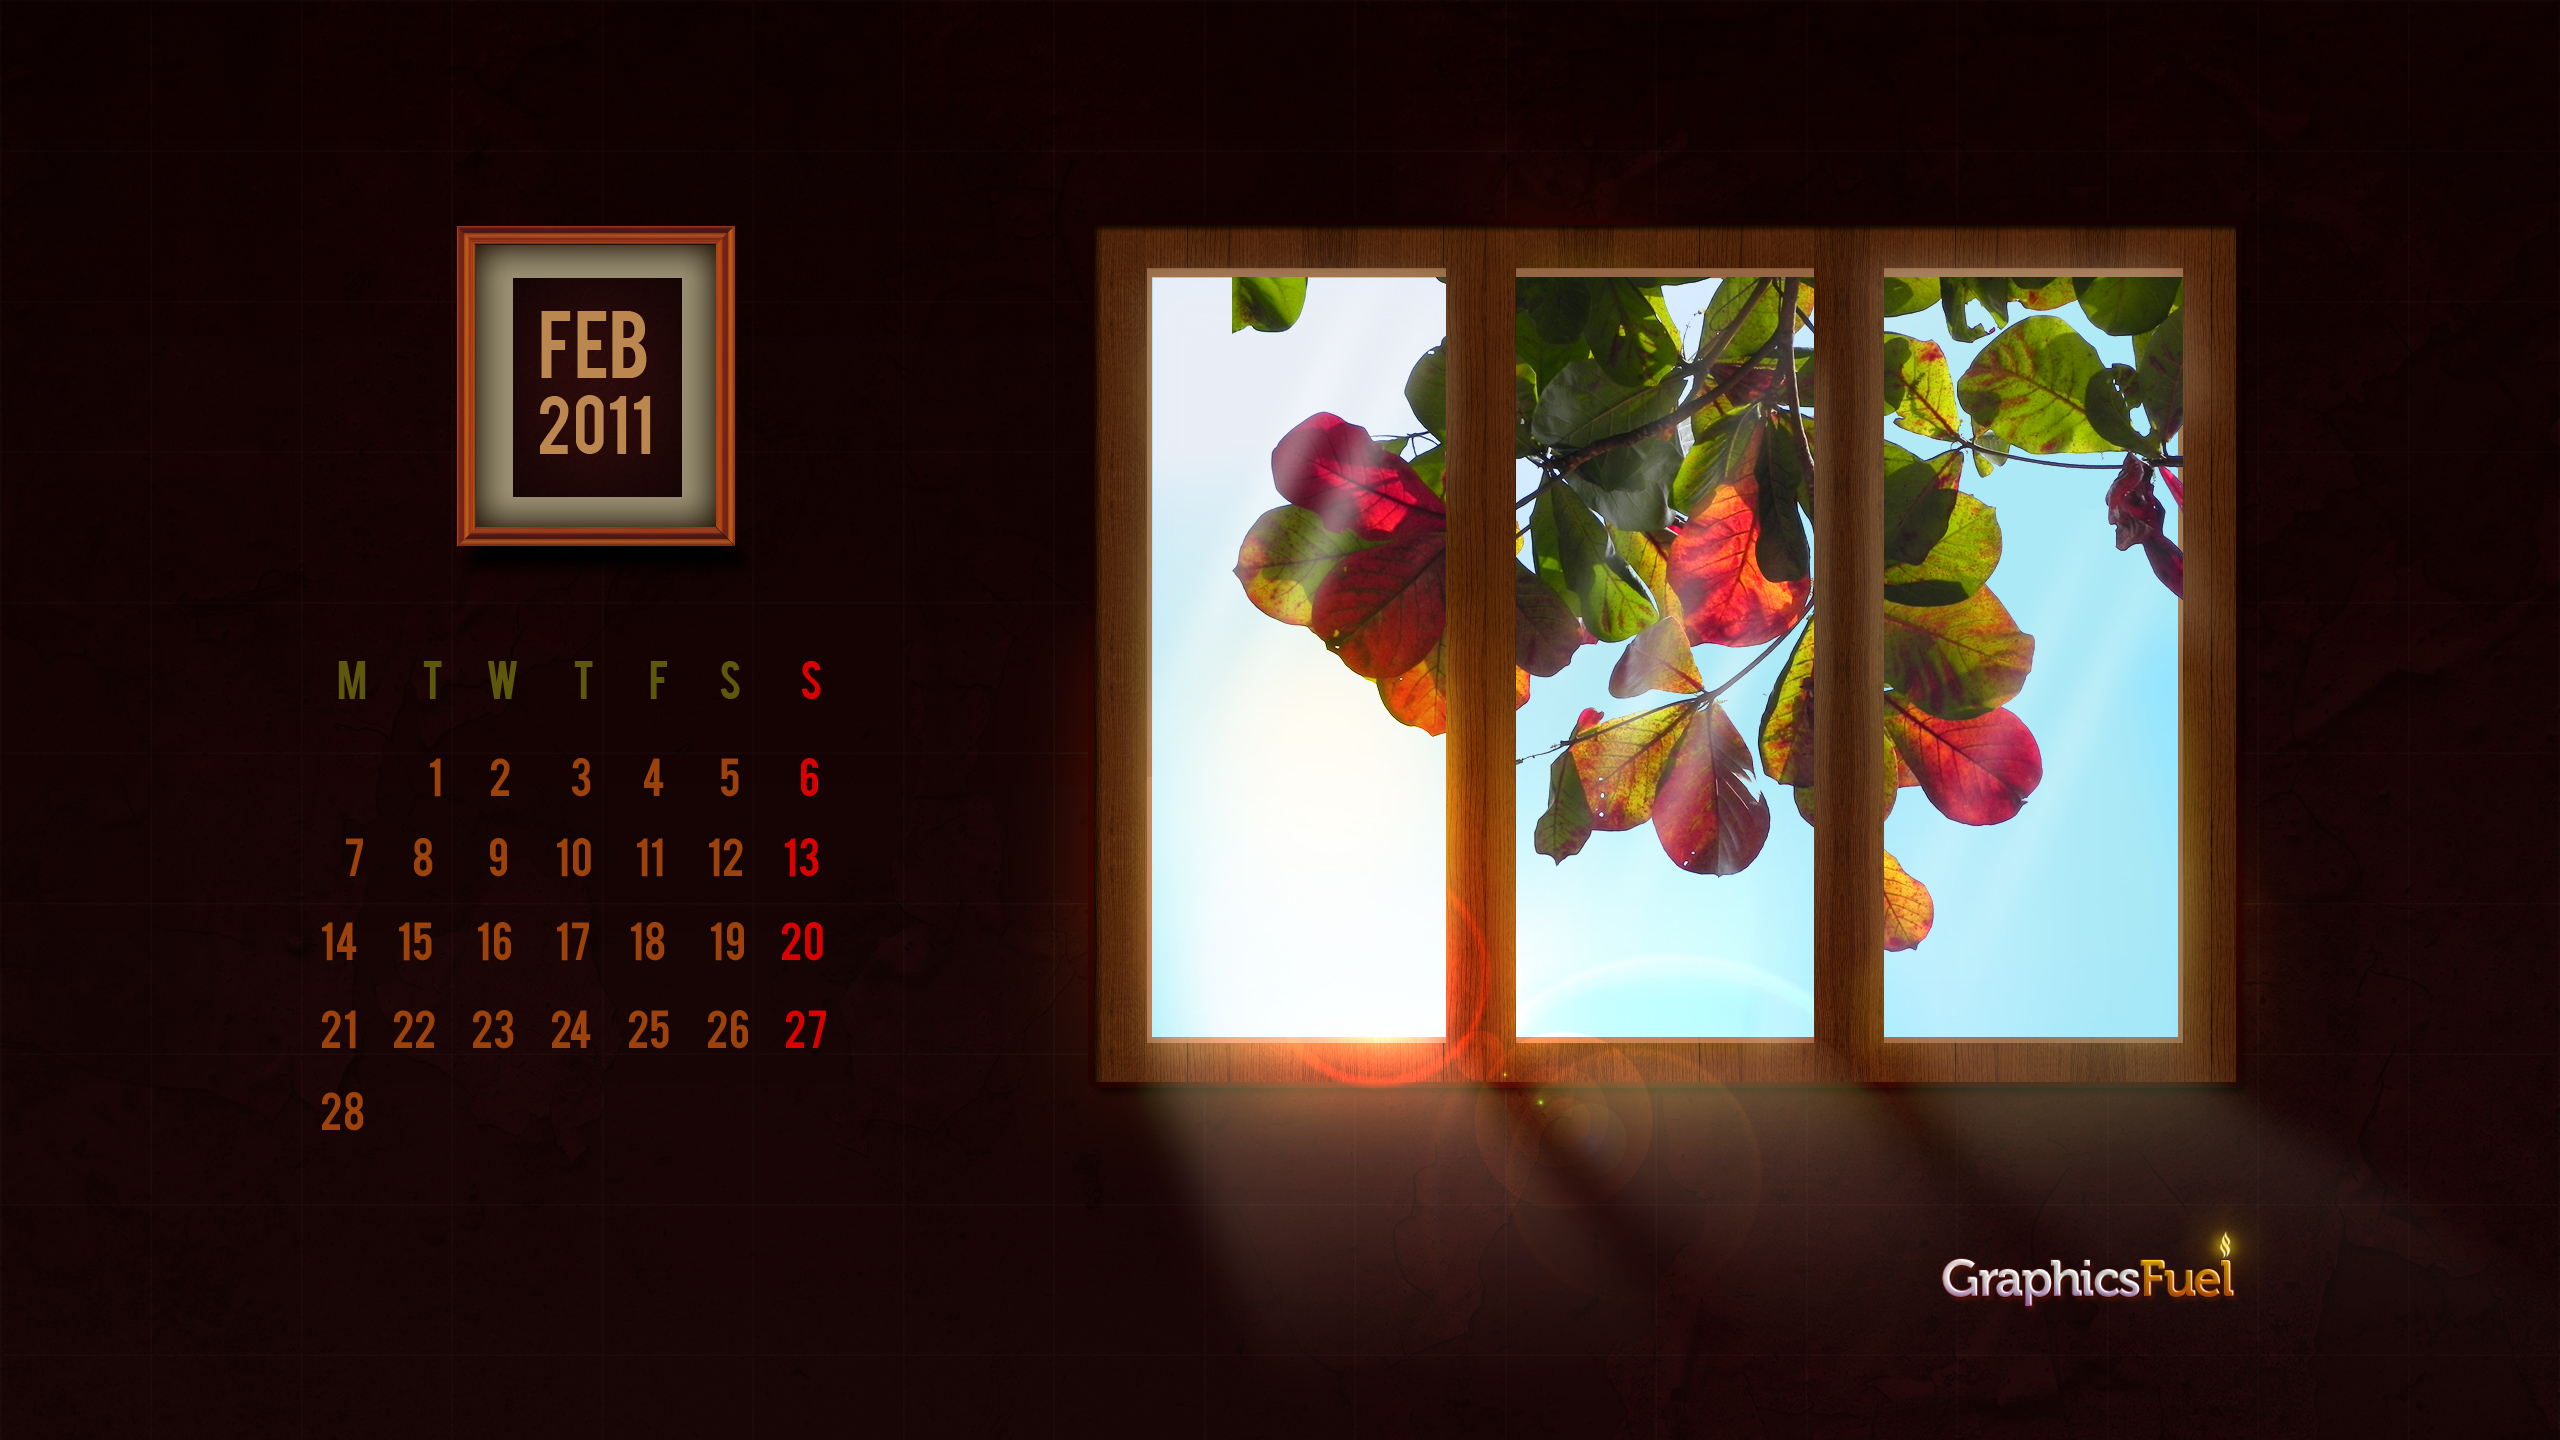 wallpaper calendar february 2011 graphicsfuel